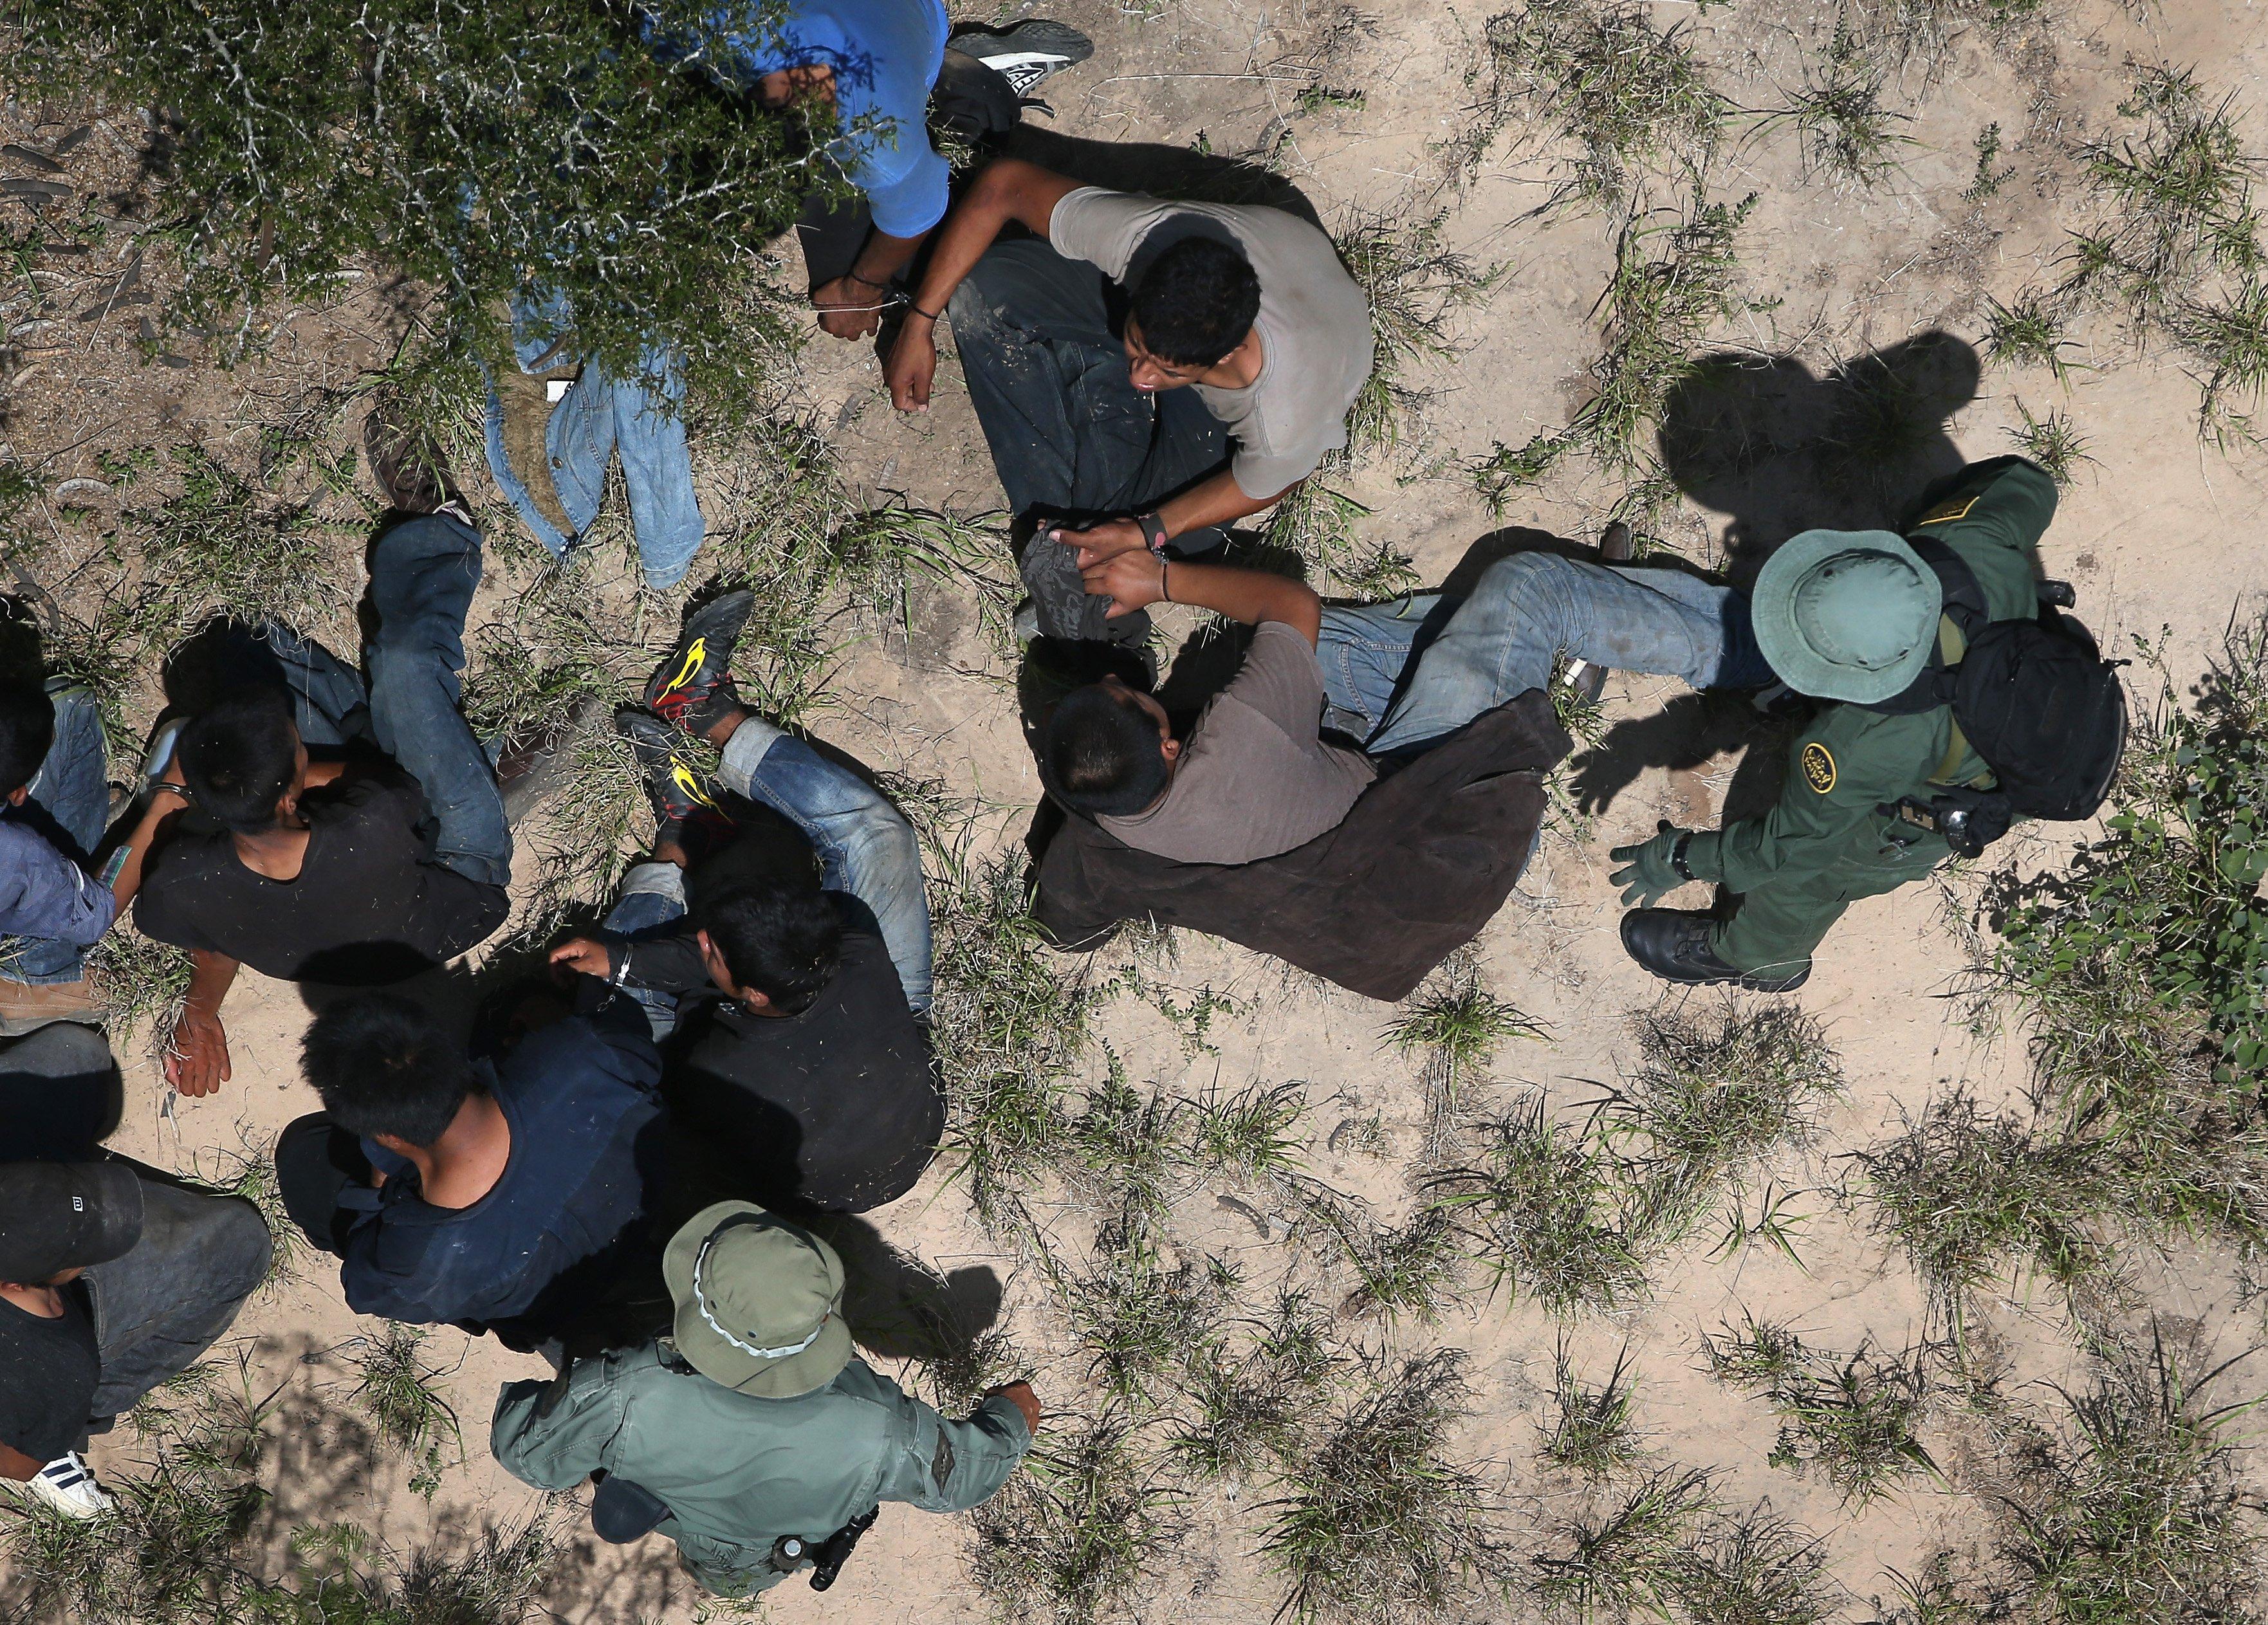 U.S. Border Patrol agents take undocumented immigrants into custody near Falfurrias, Texas on July 21, 2014.